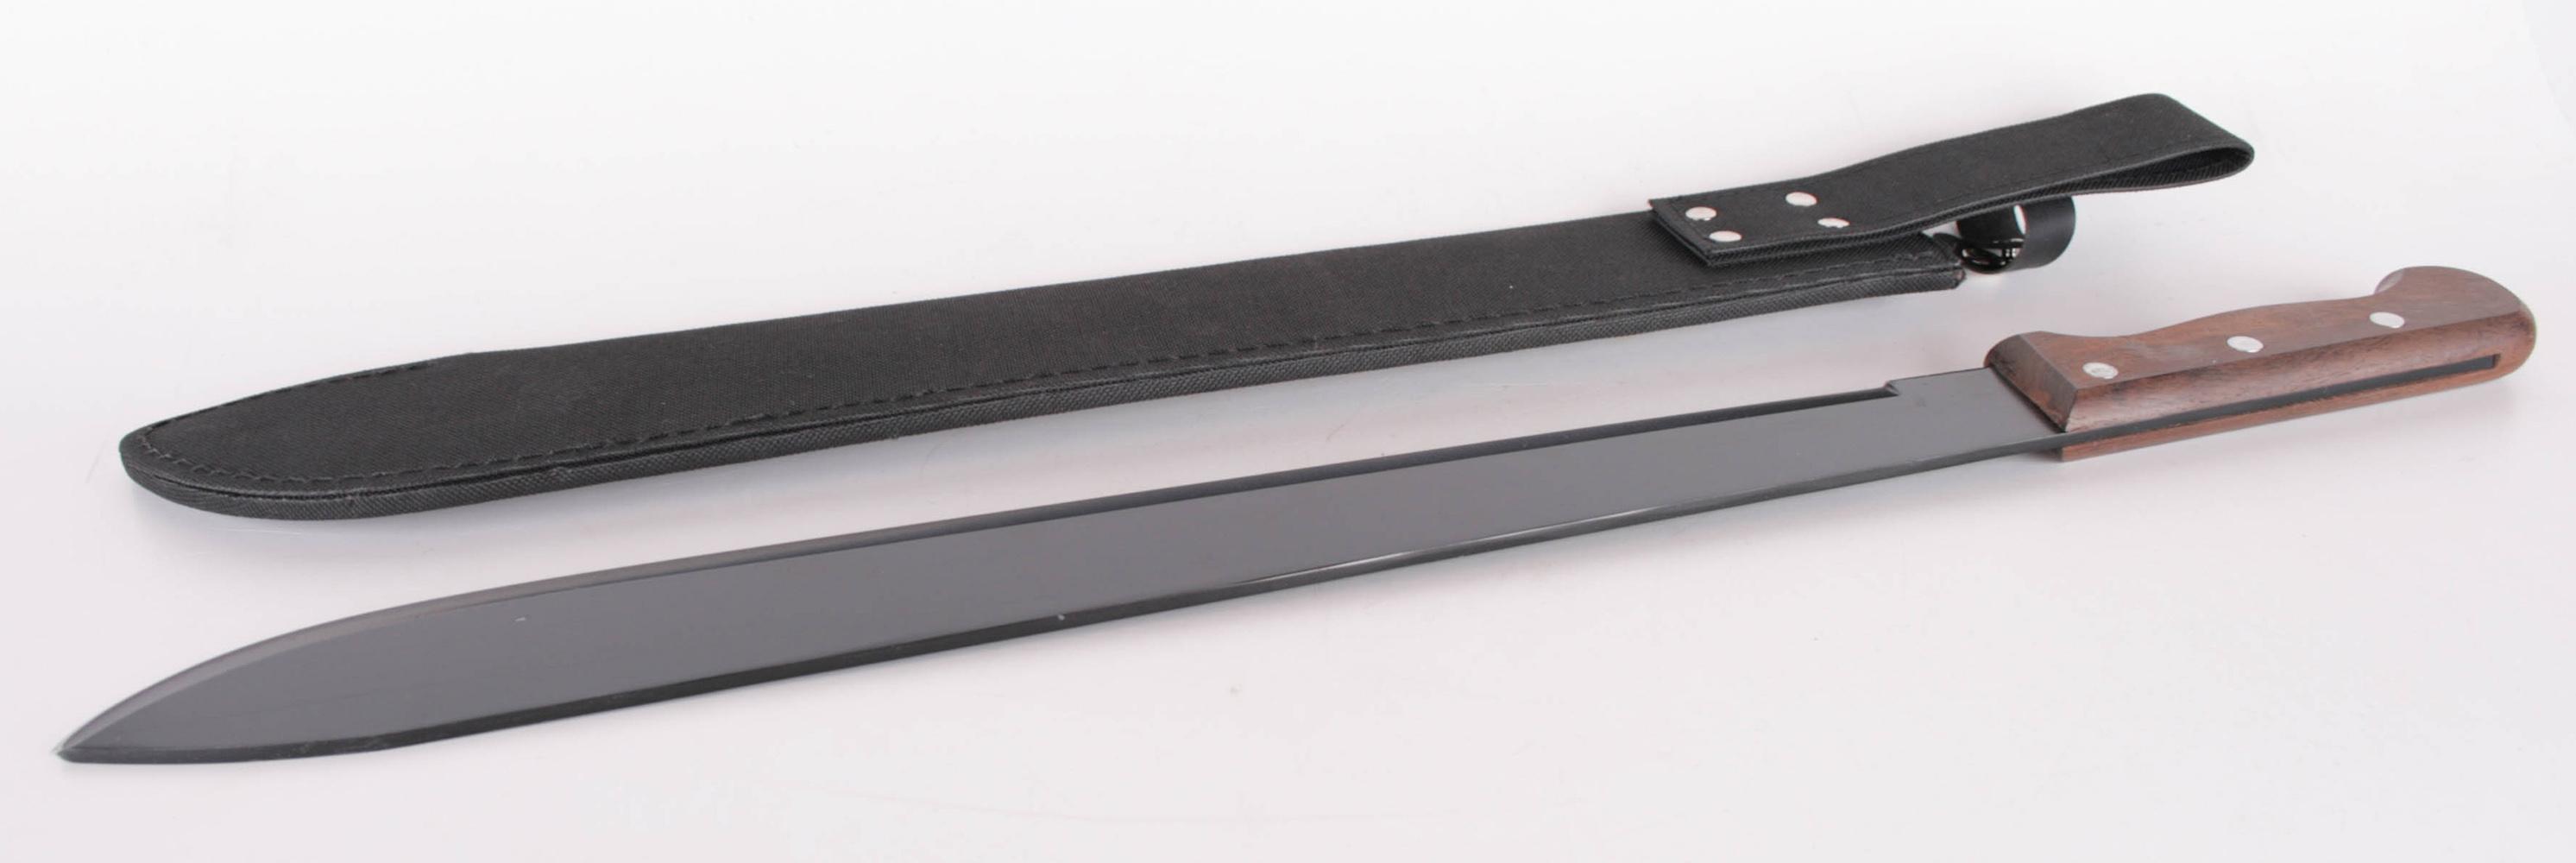 150745 Herbertz Machete Klinge 45cm mit Nylonscheide Nr